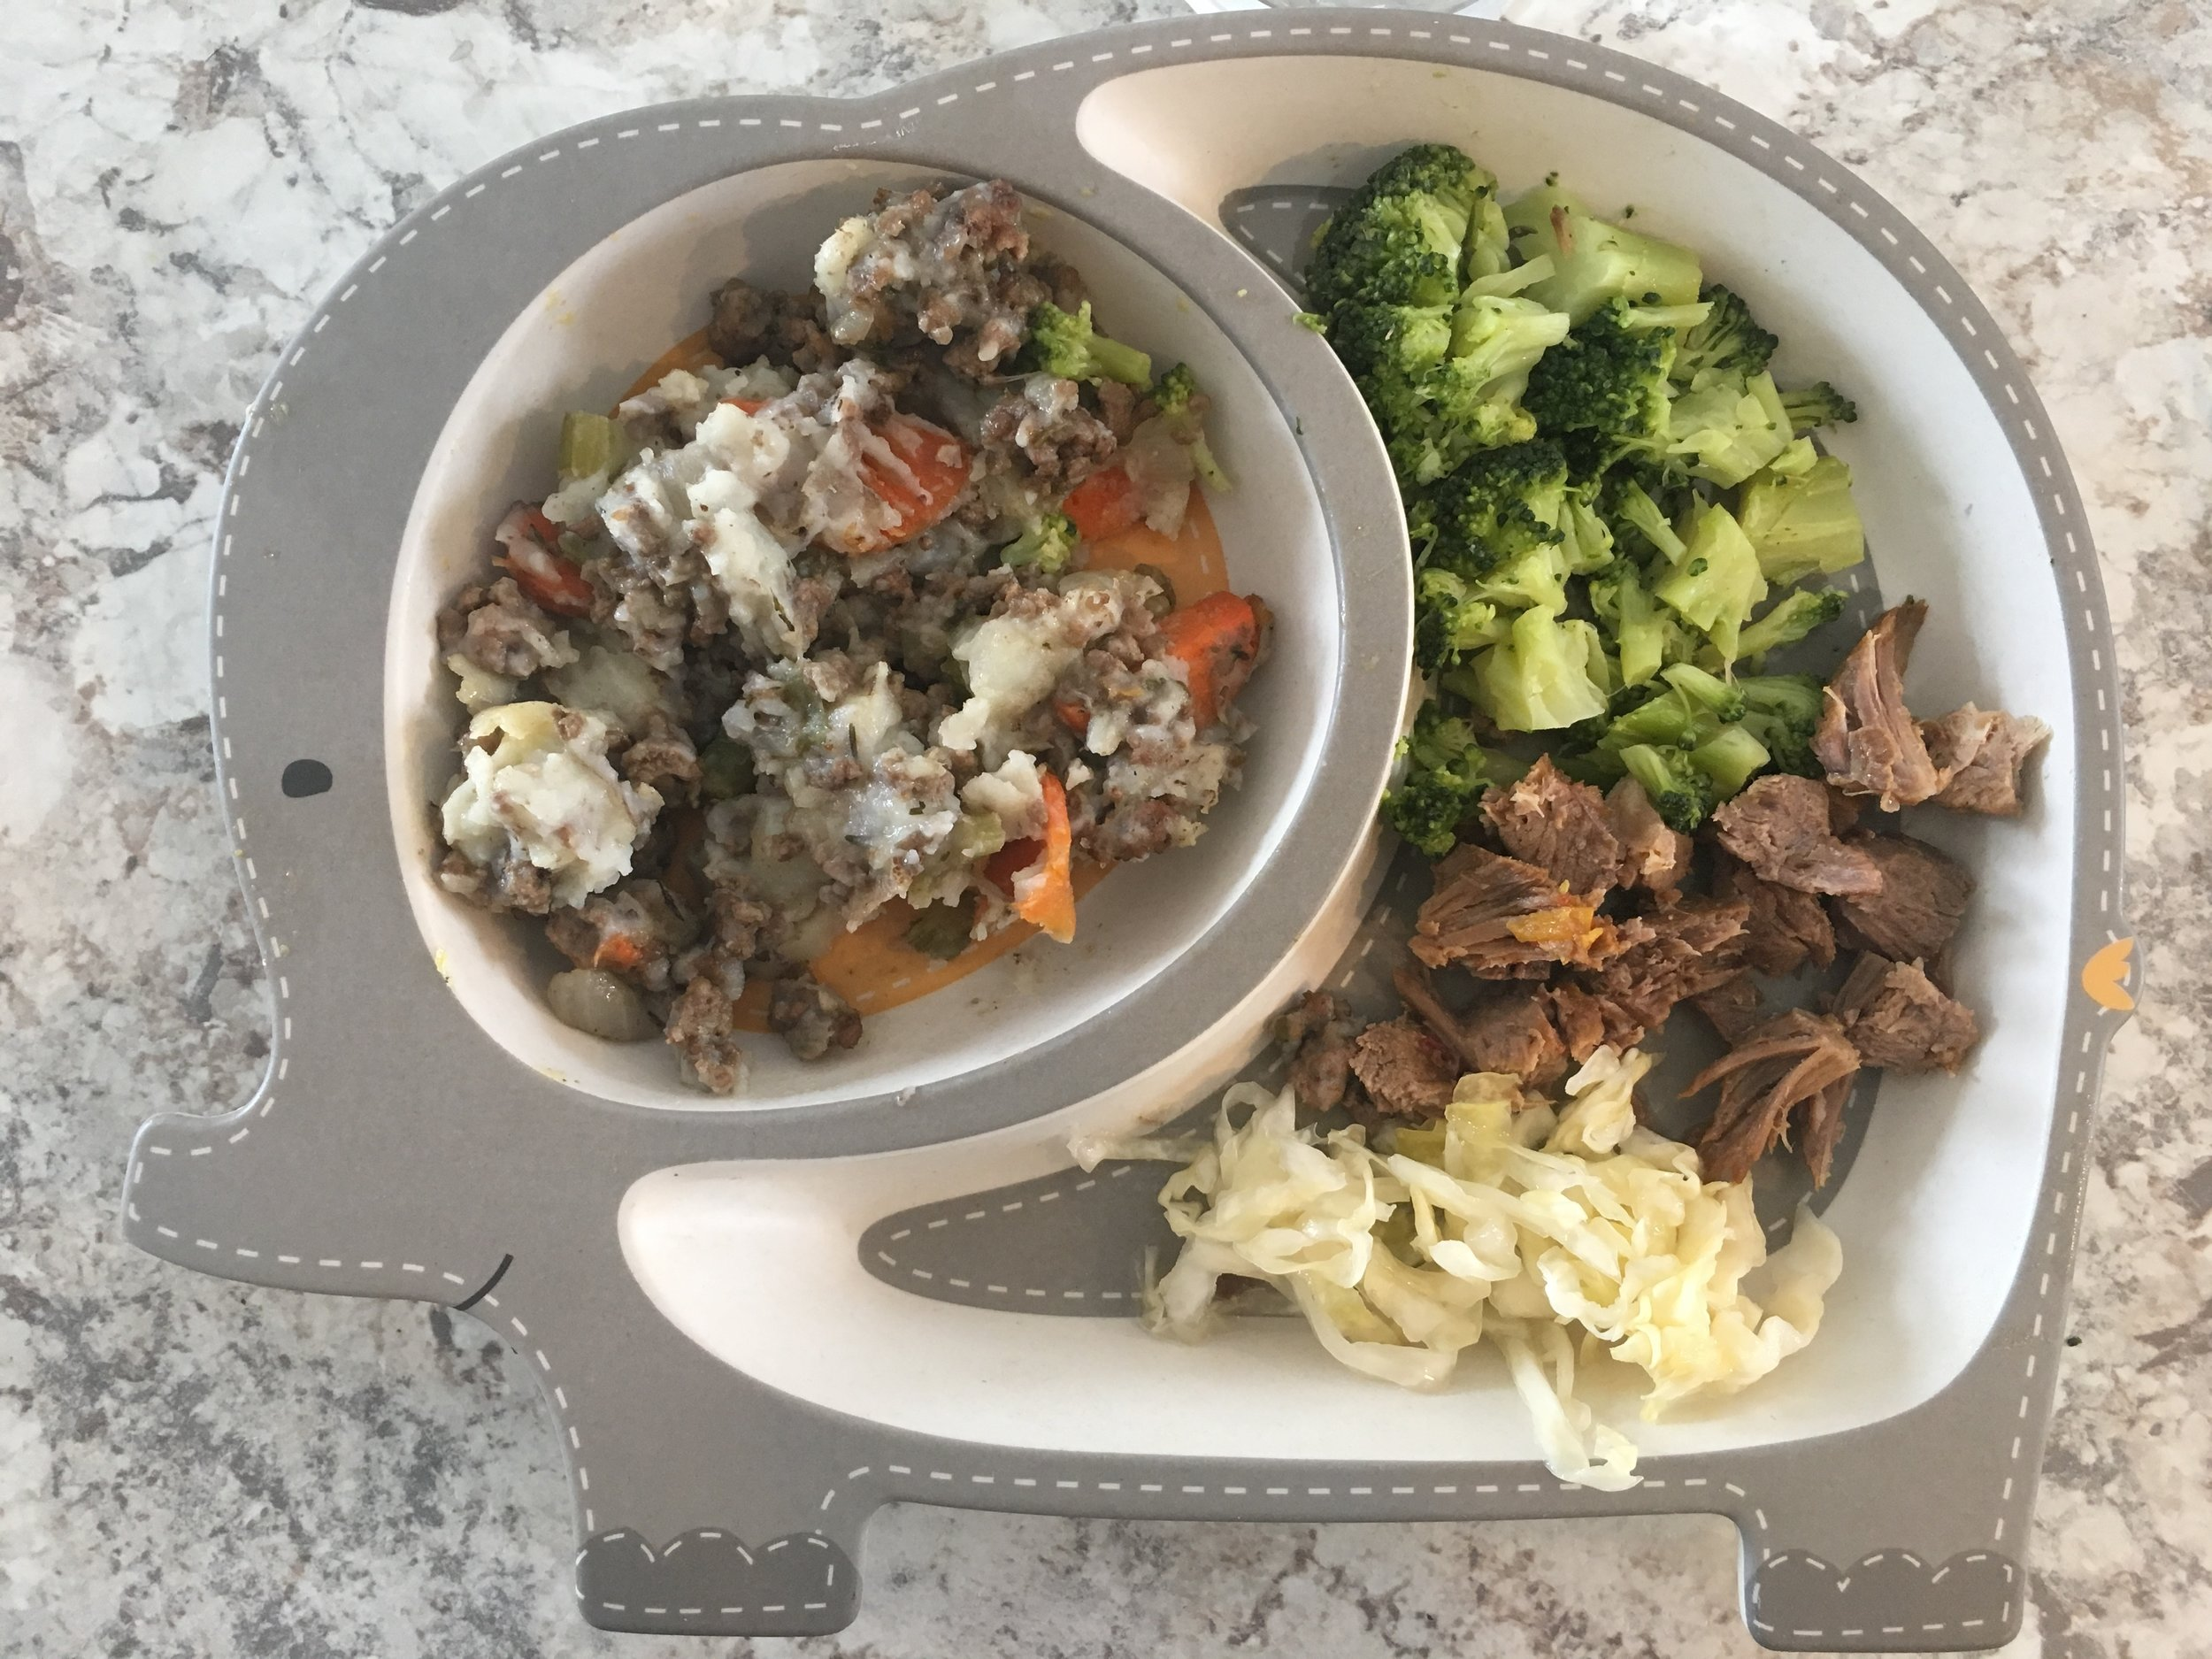 Shepherd's pie, broccoli, sauerkraut, and a little roast